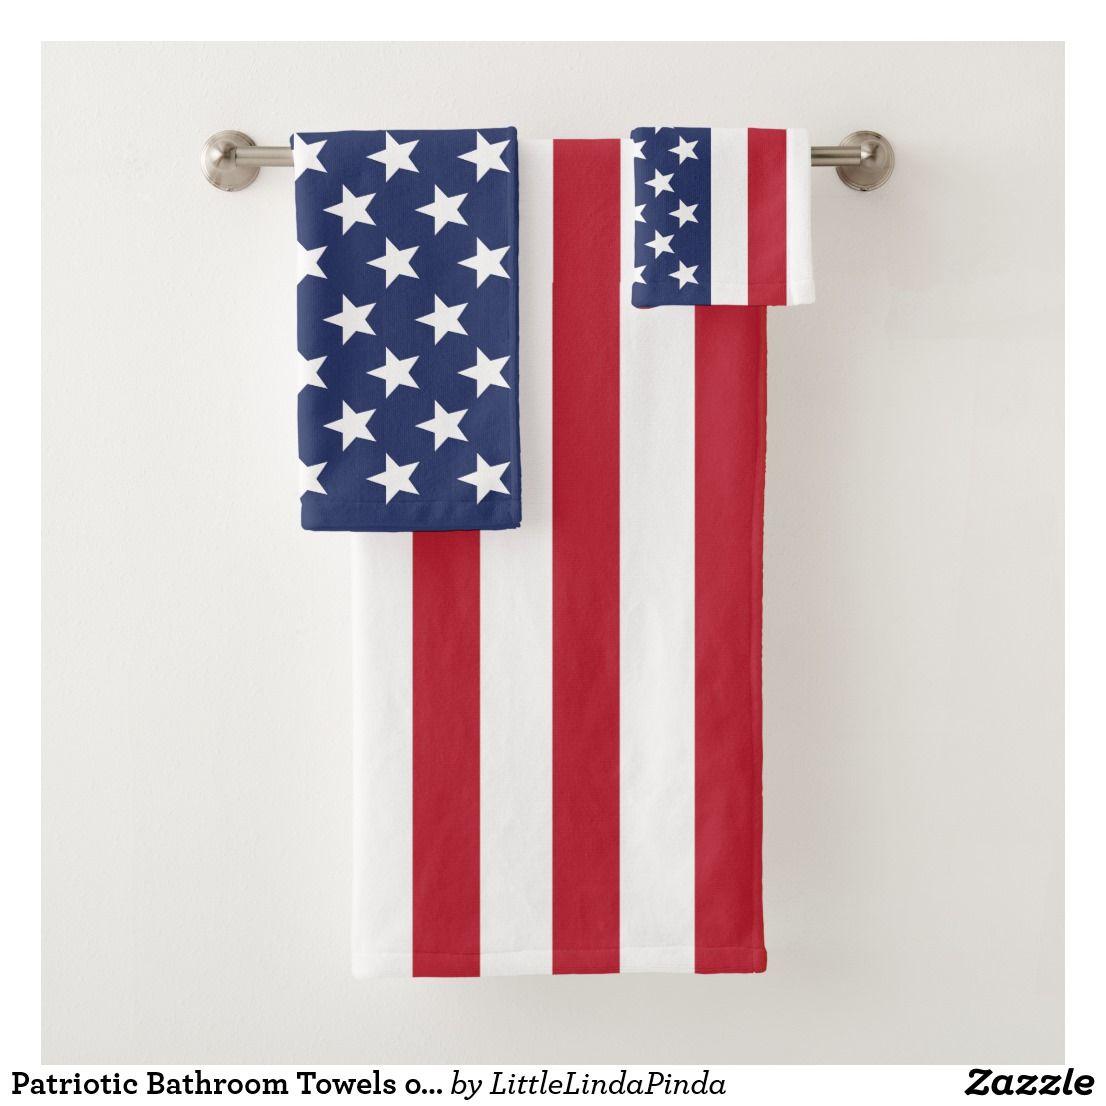 Patriotic Bathroom Towels Or Change To Your Images Zazzle Com American Flag Decor Custom Towel Bathroom Towels American flag bathroom decor